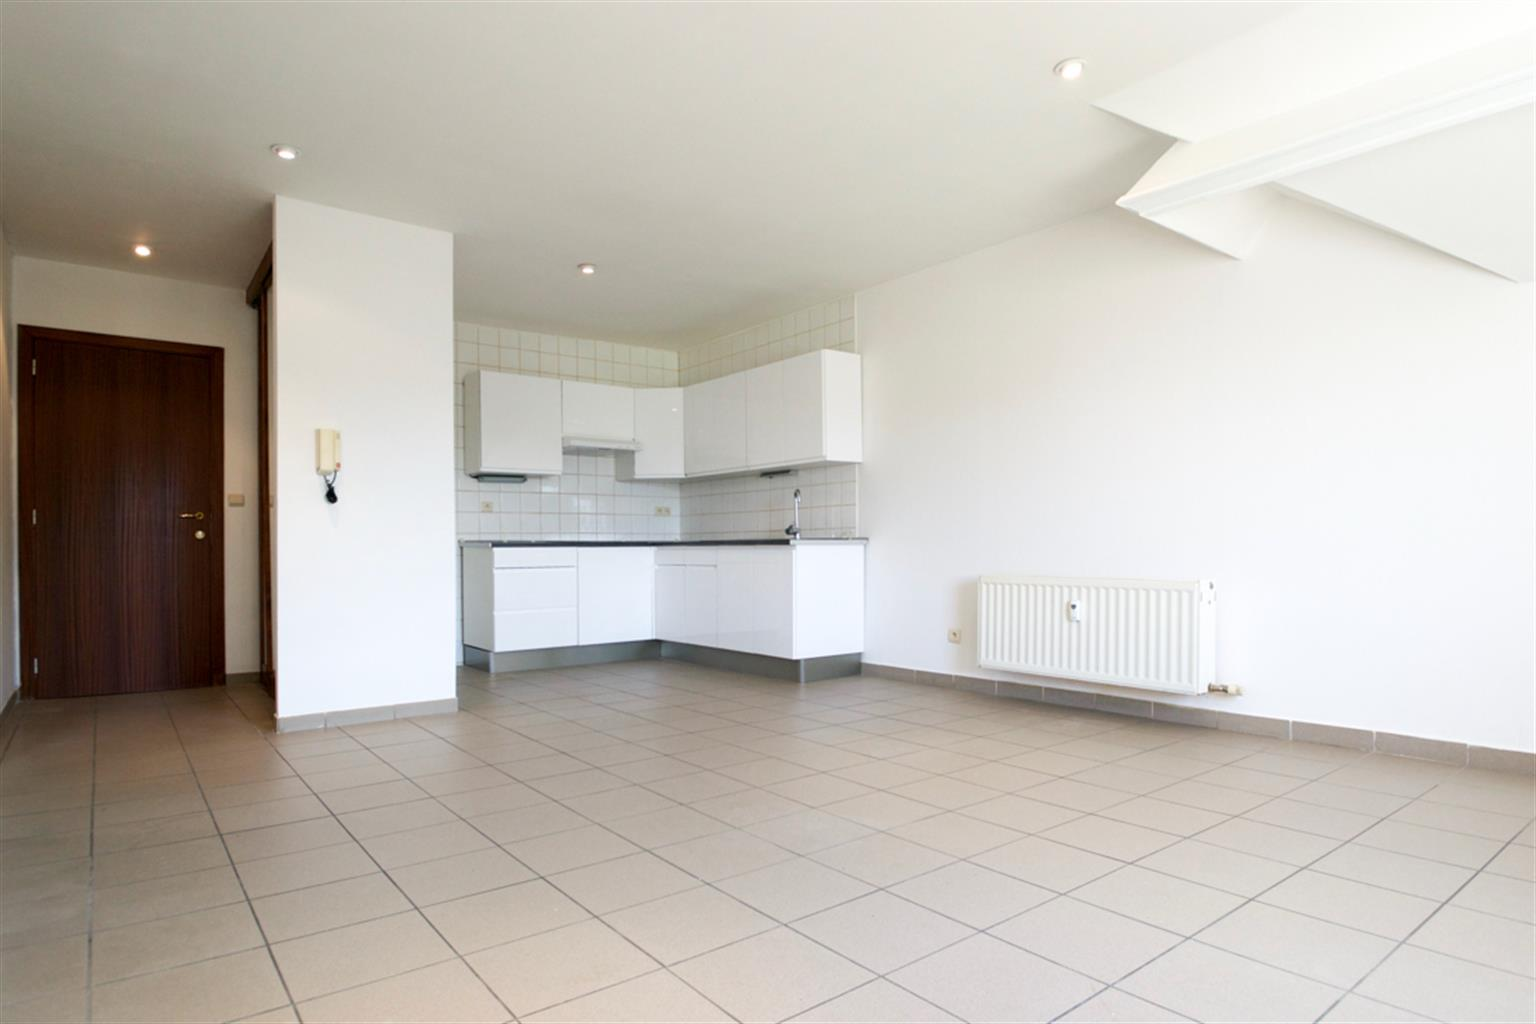 Appartement - Leval-Trahegnies - #3779559-0